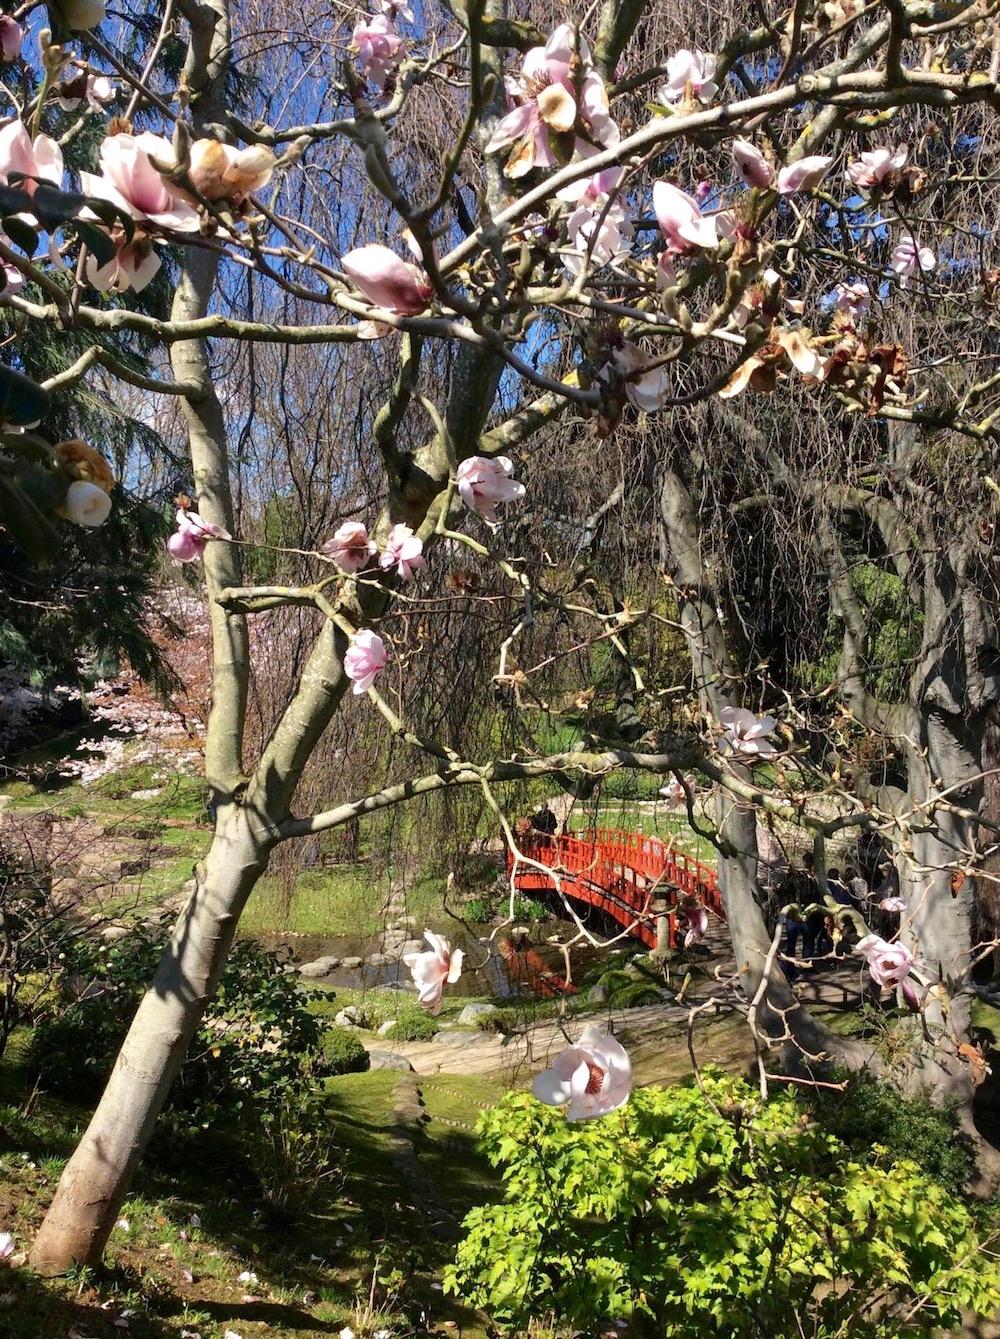 jardin-albert-kahn-boulognebillancourt-hanami